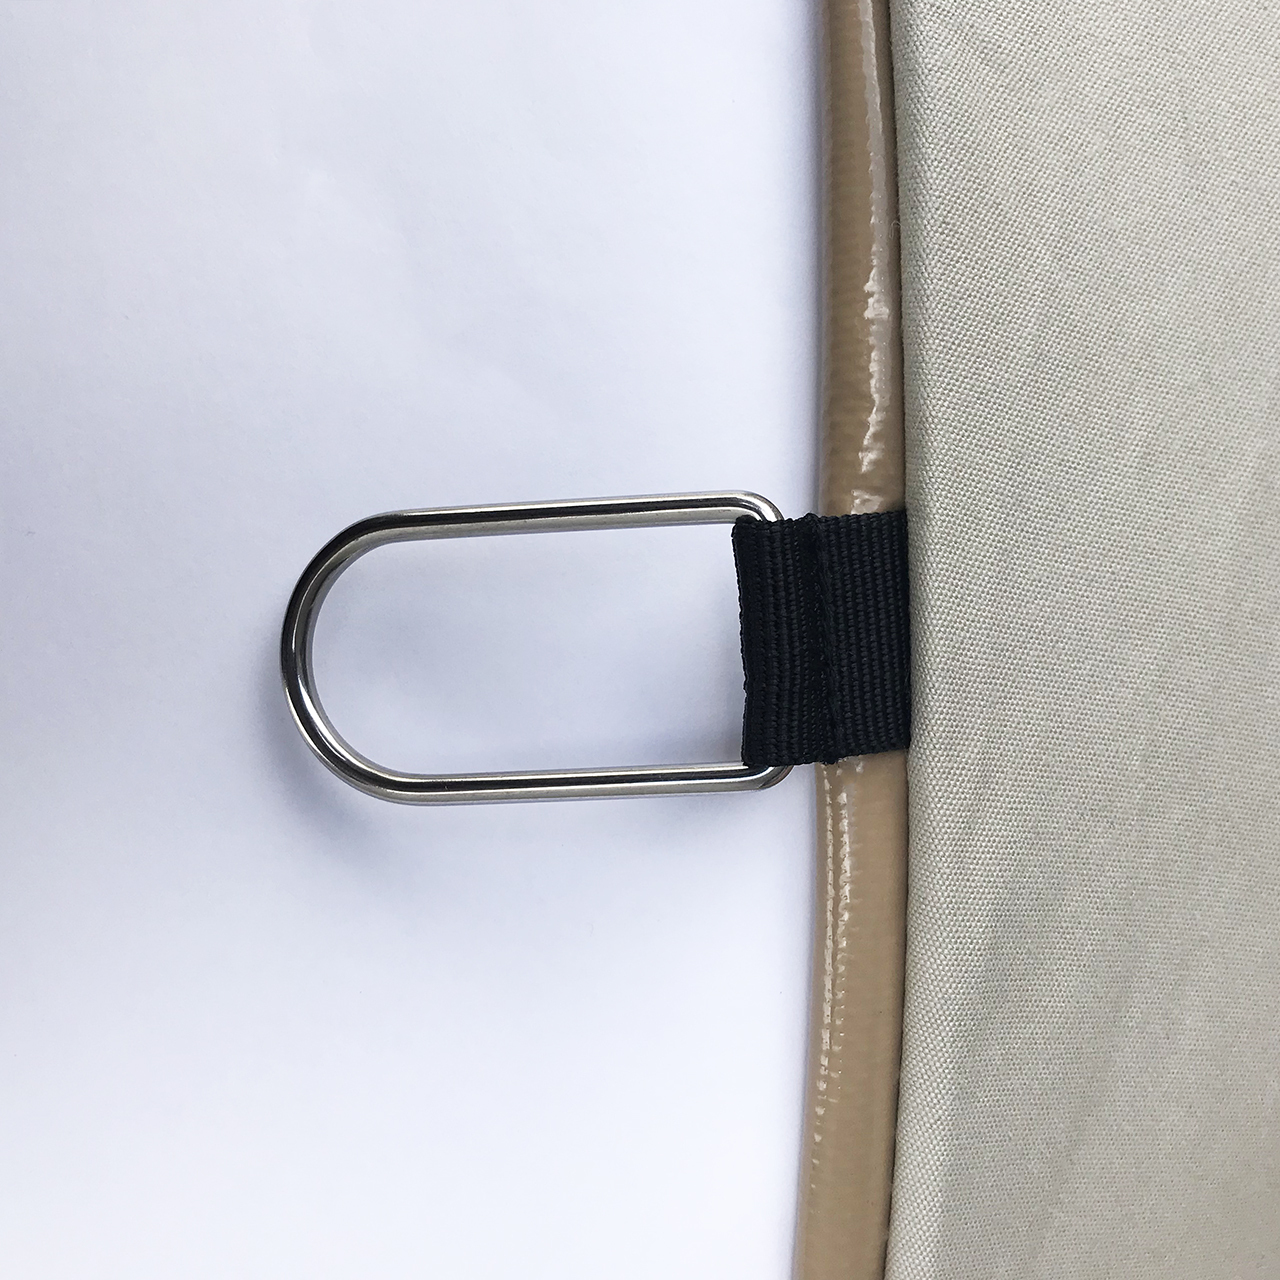 10 x 10 ft. Flex-Bow Canvas Tent Deluxe